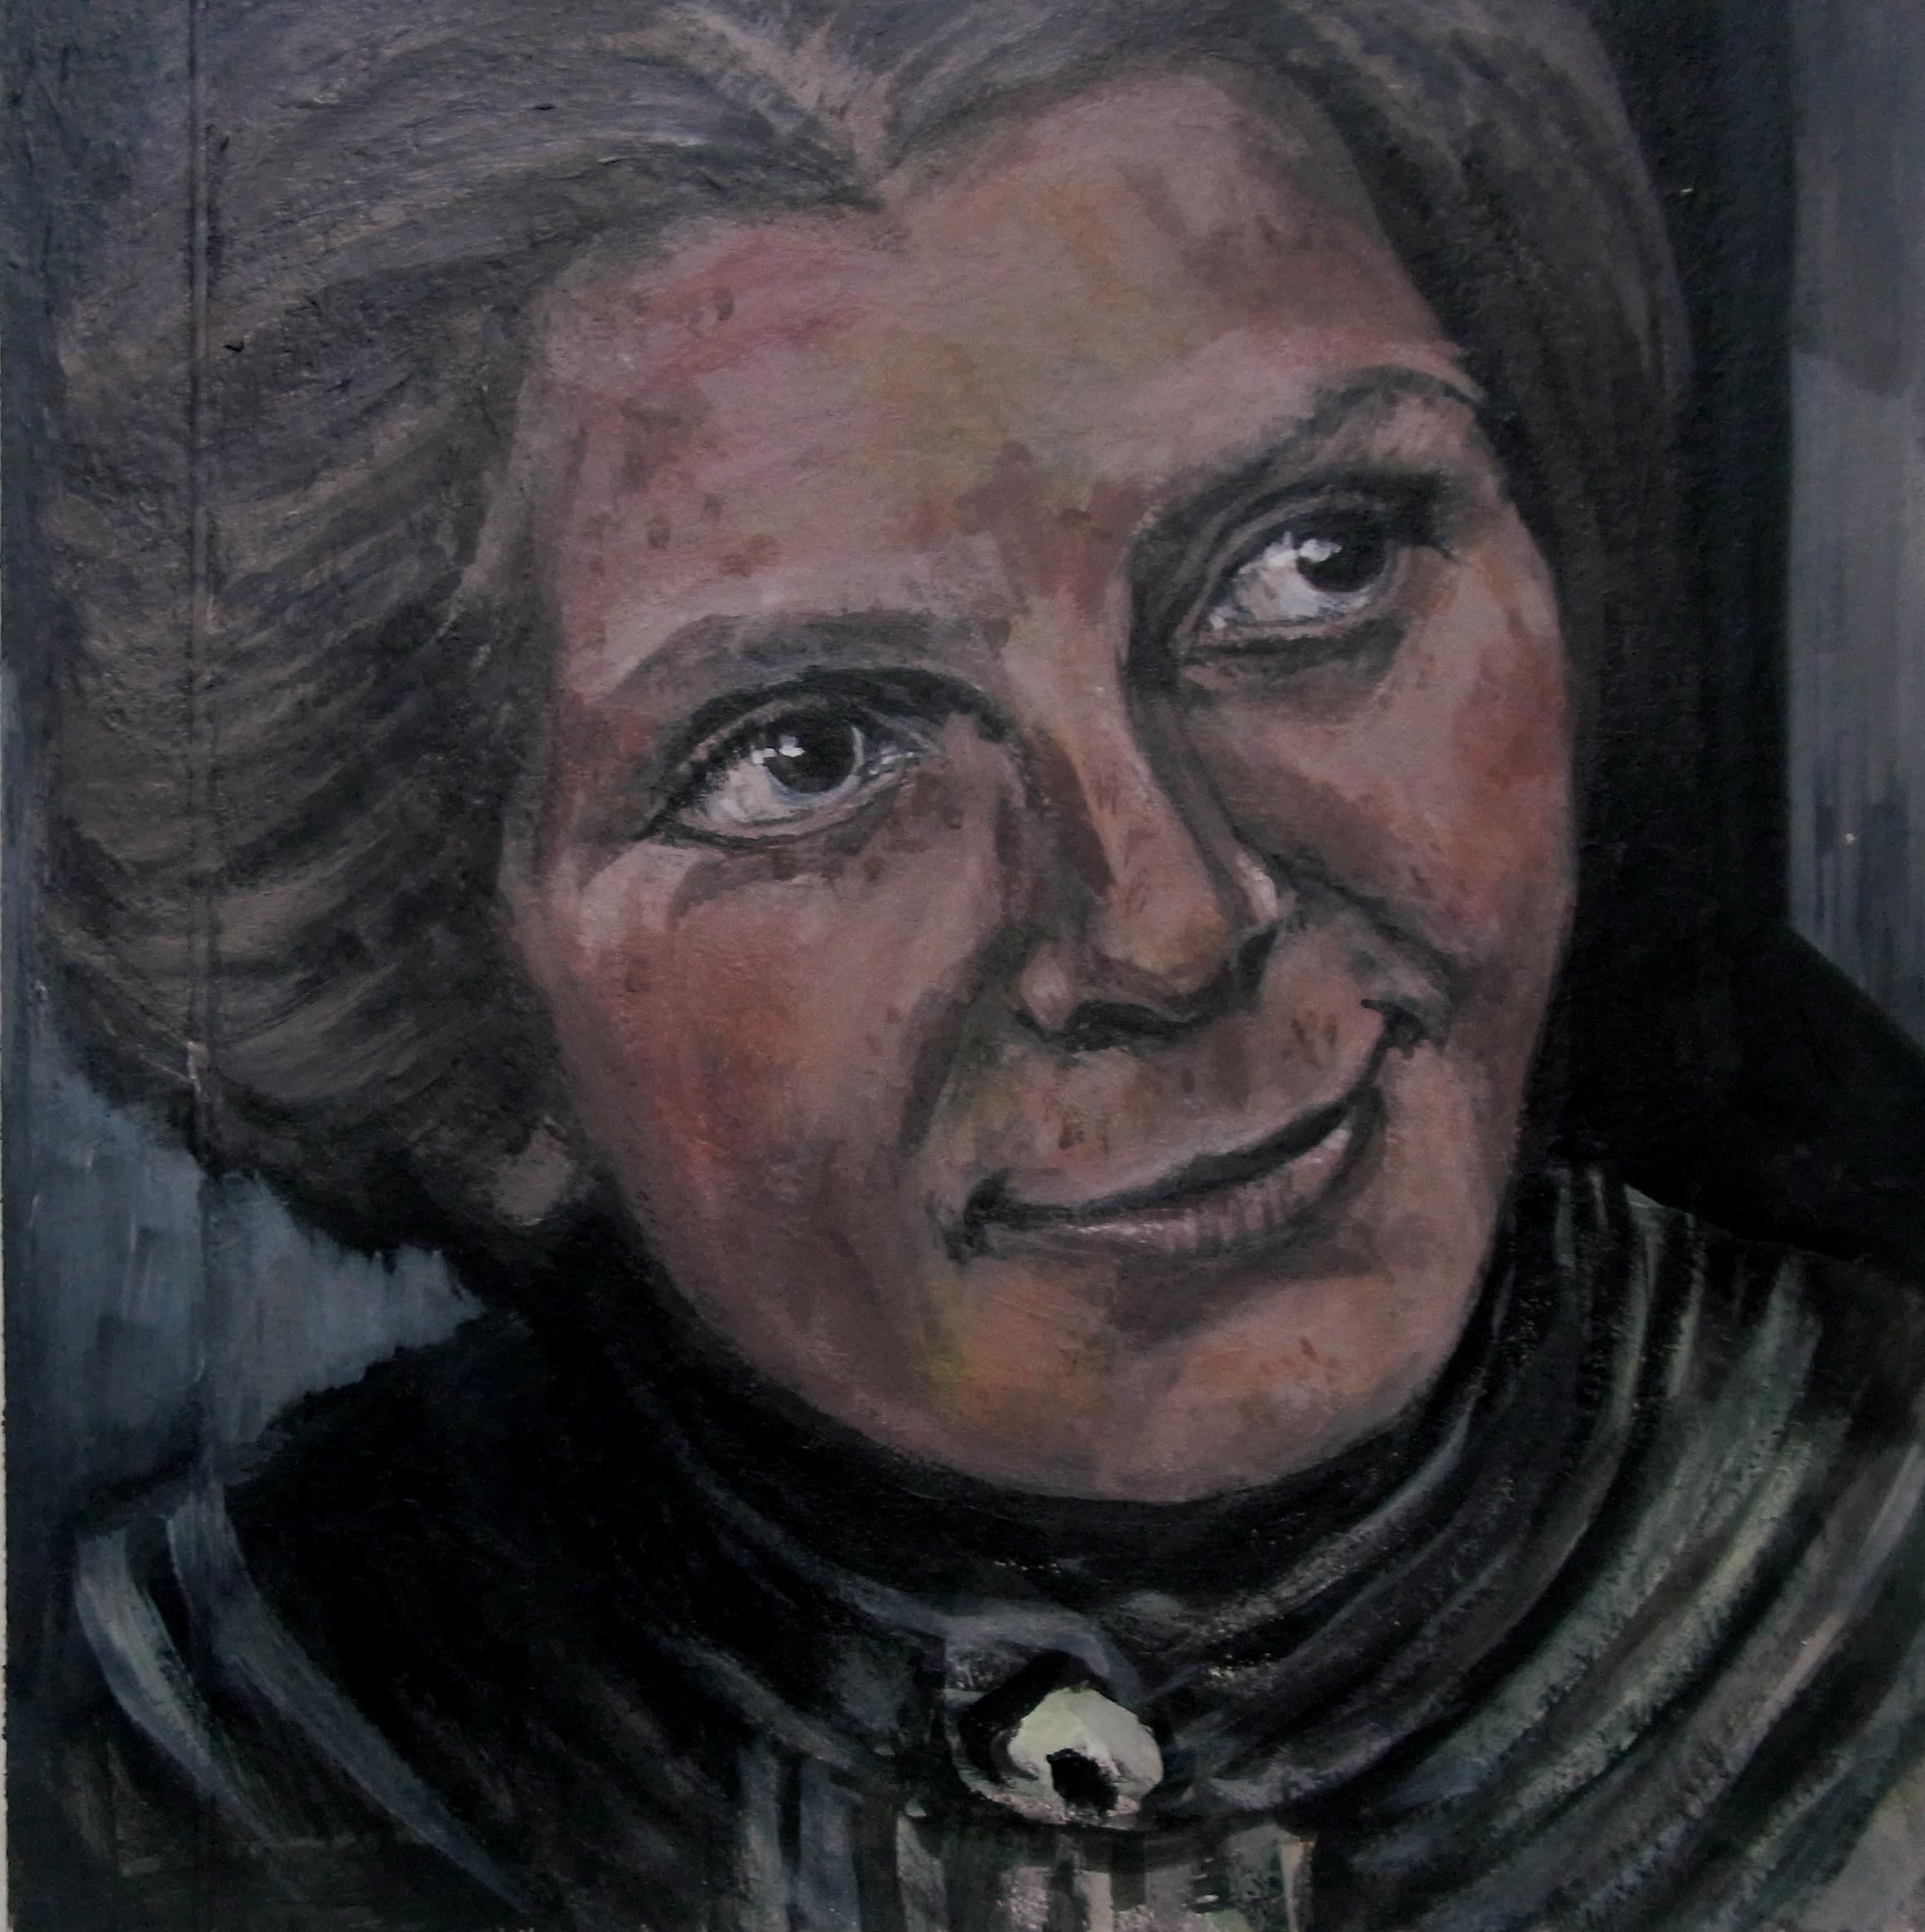 Briefe Und Tagebuchblätter Von Paula Modersohn Becker : Pizzakartonmalerei helen königs